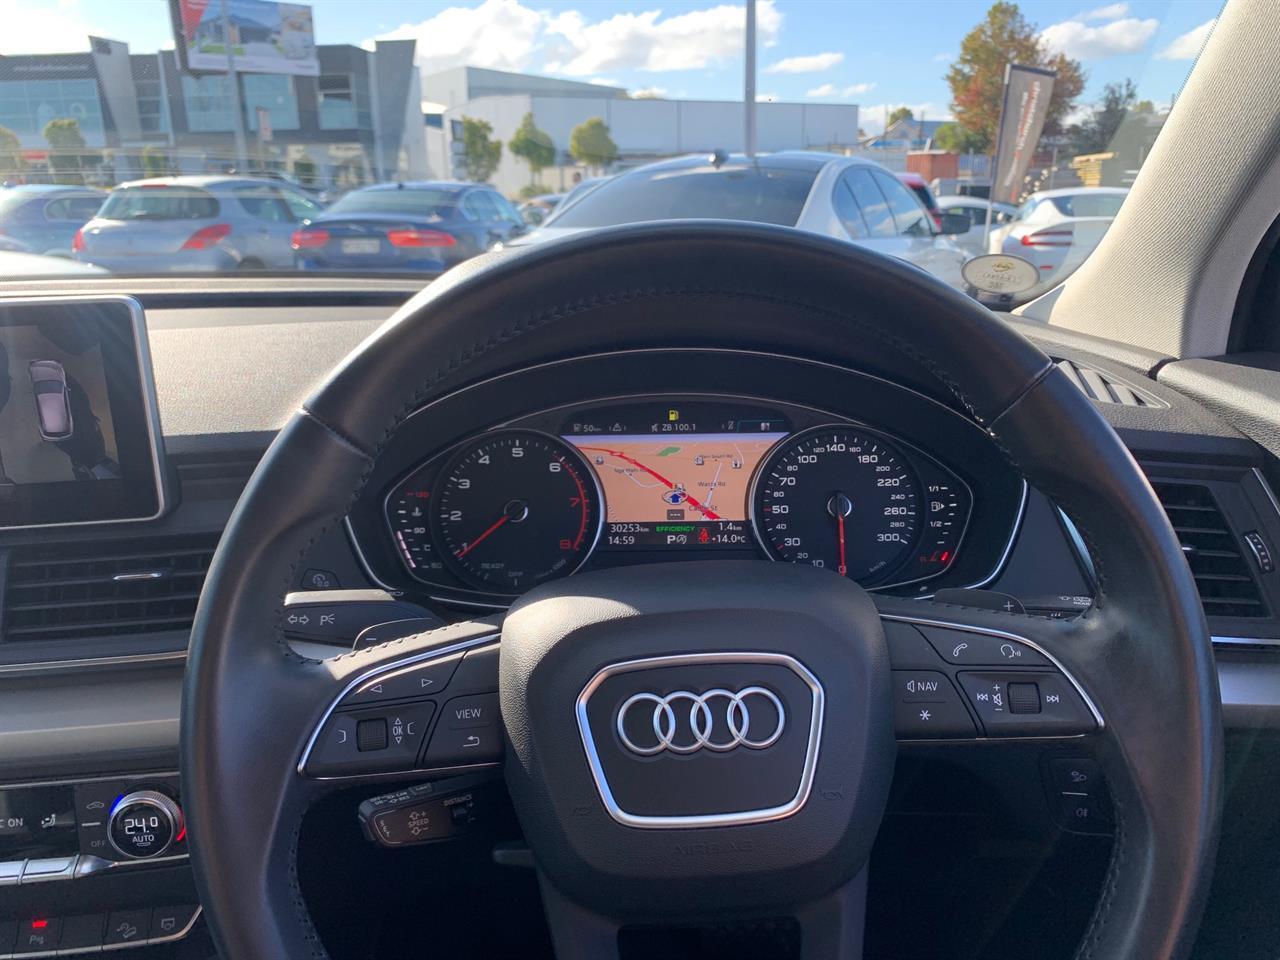 image-10, 2017 Audi Q5 2.0T FSI New Model Quattro at Christchurch